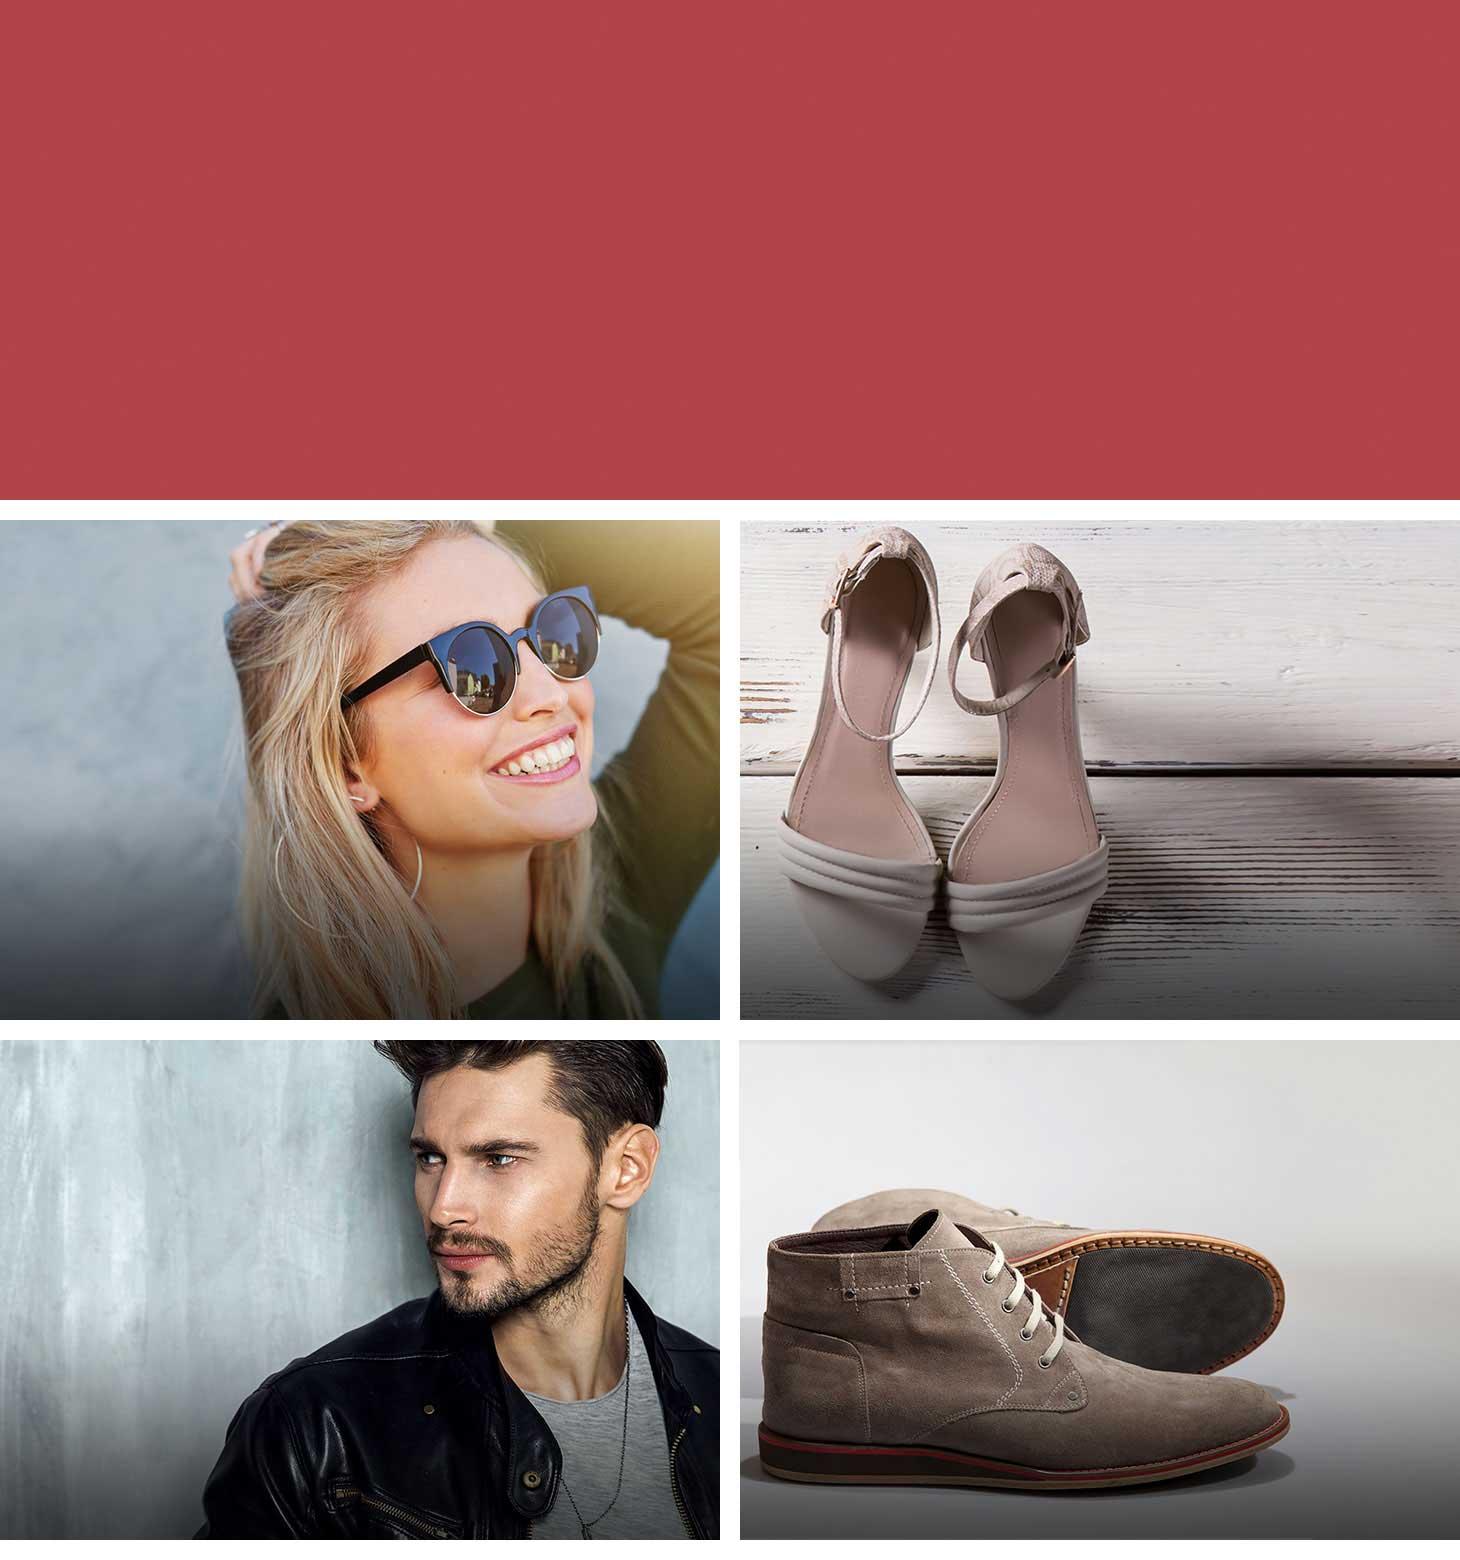 Udsalg dametøj Tøj, overtøj, sko, støvler, accessories til